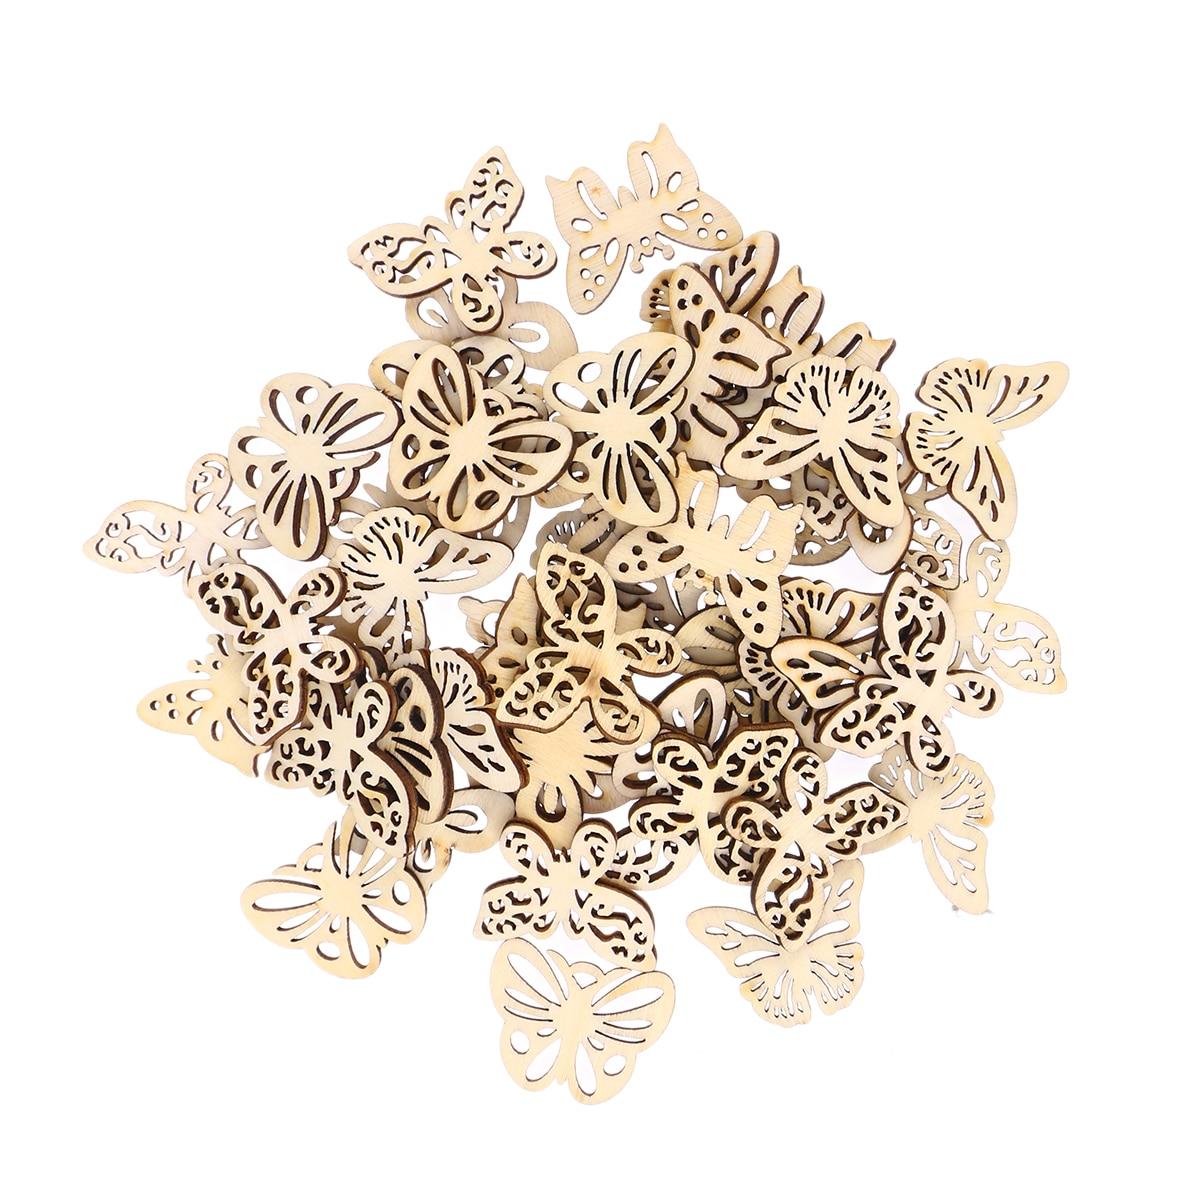 50 unidades de recortes variados de mariposas de madera para manualidades, adornos de madera para manualidades, adornos para manualidades, decoraciones artísticas para bodas (33mm)